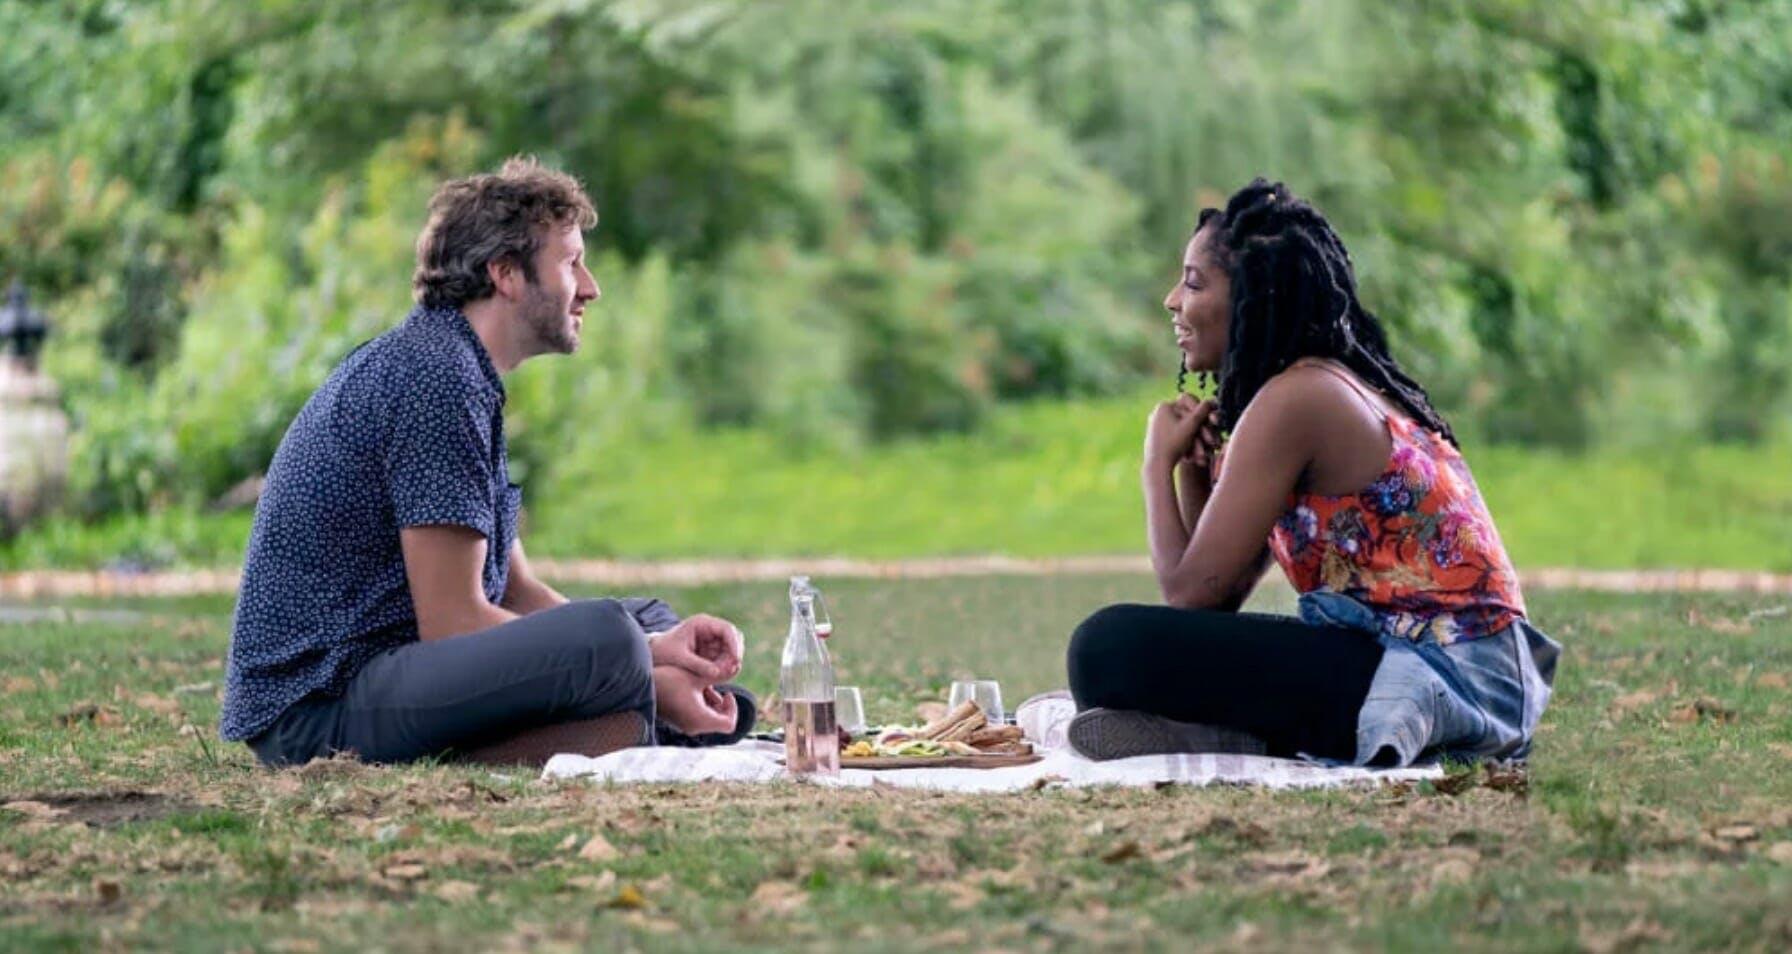 netflix romantic comedies - the incredible jessica james